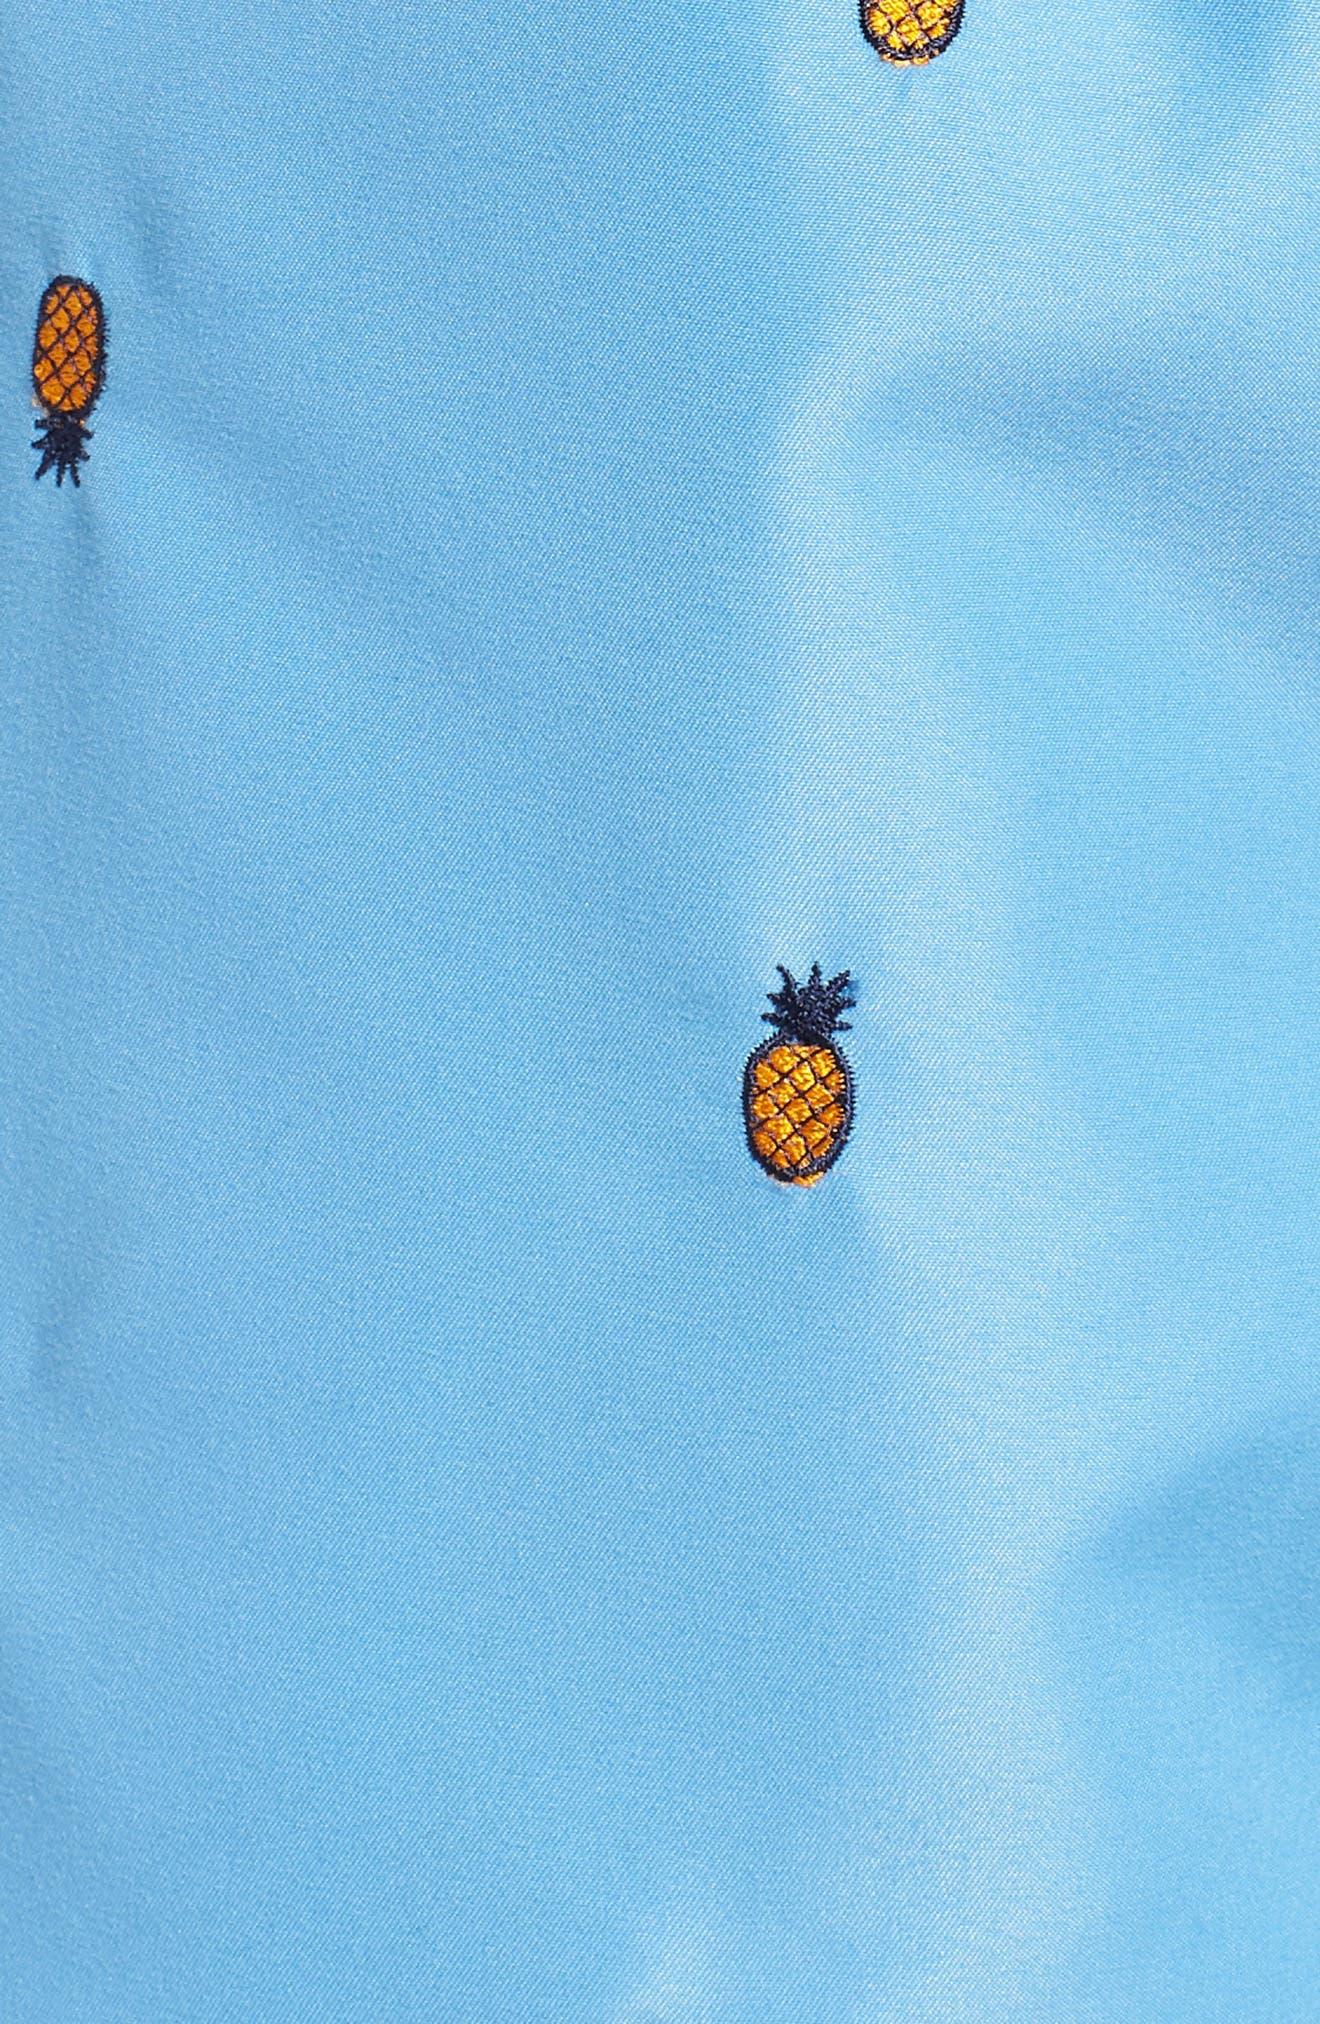 Premium Embroidered Sano Swim Trunks,                             Alternate thumbnail 5, color,                             PERISIAN BLUE